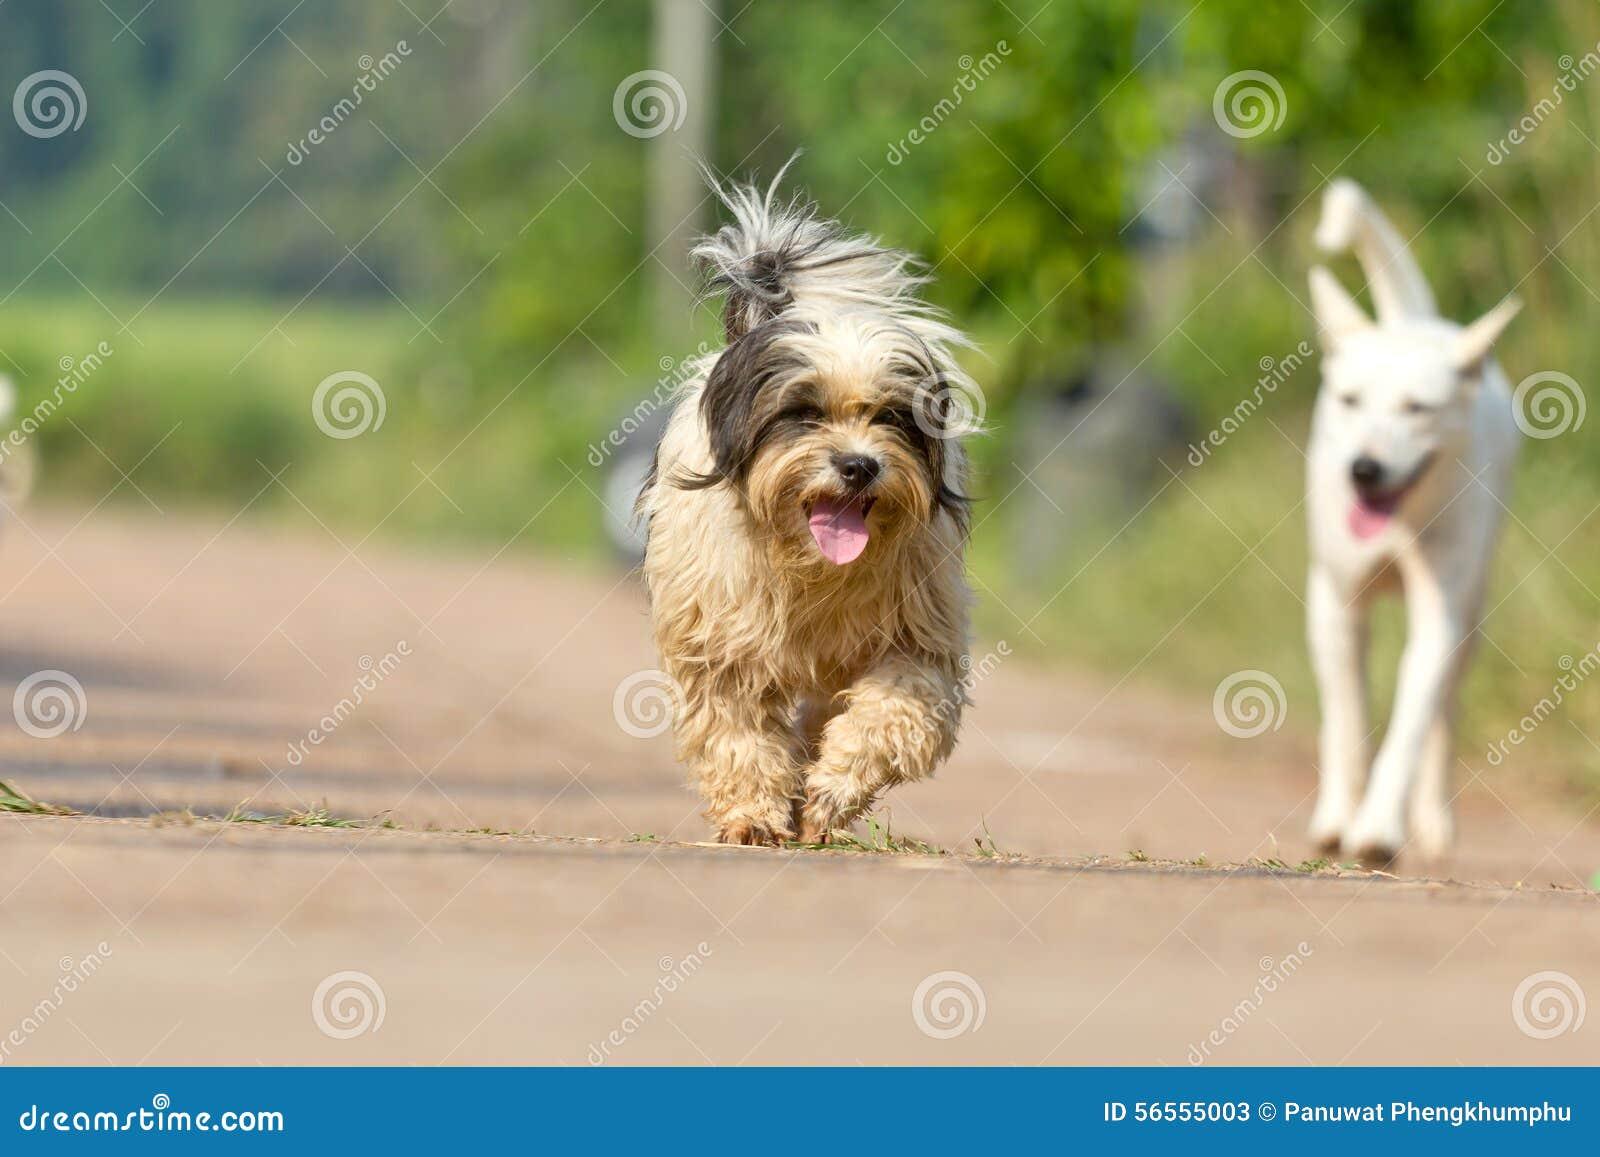 Download Το σκυλί που τρέχει ή που περπατά στο δρόμο Στοκ Εικόνα - εικόνα από ημέρα, ένας: 56555003